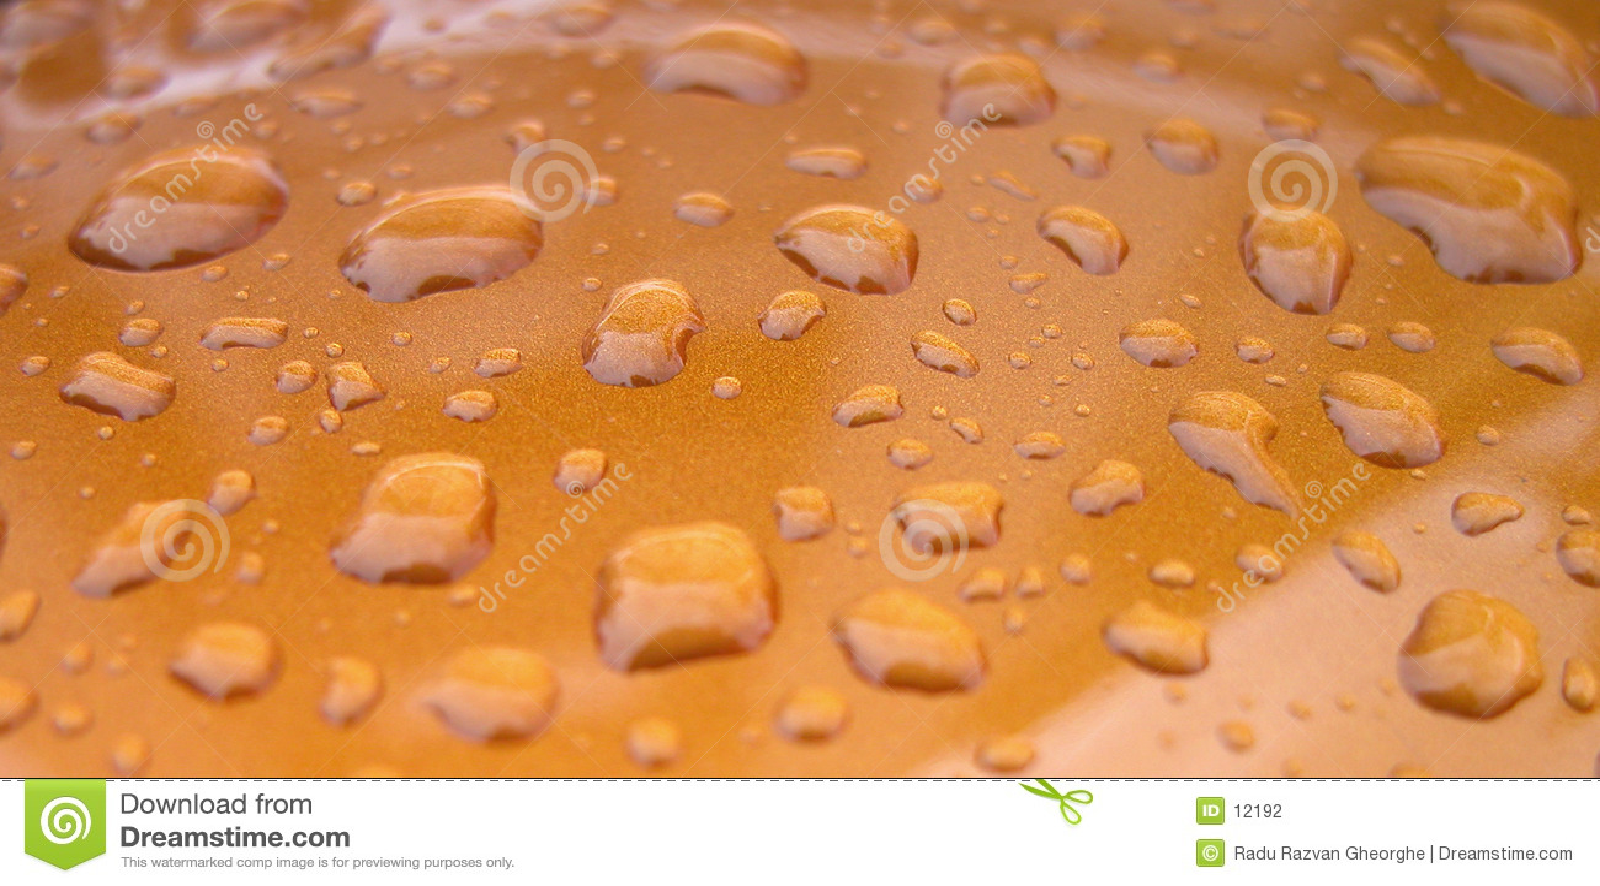 Krople wody tekstury